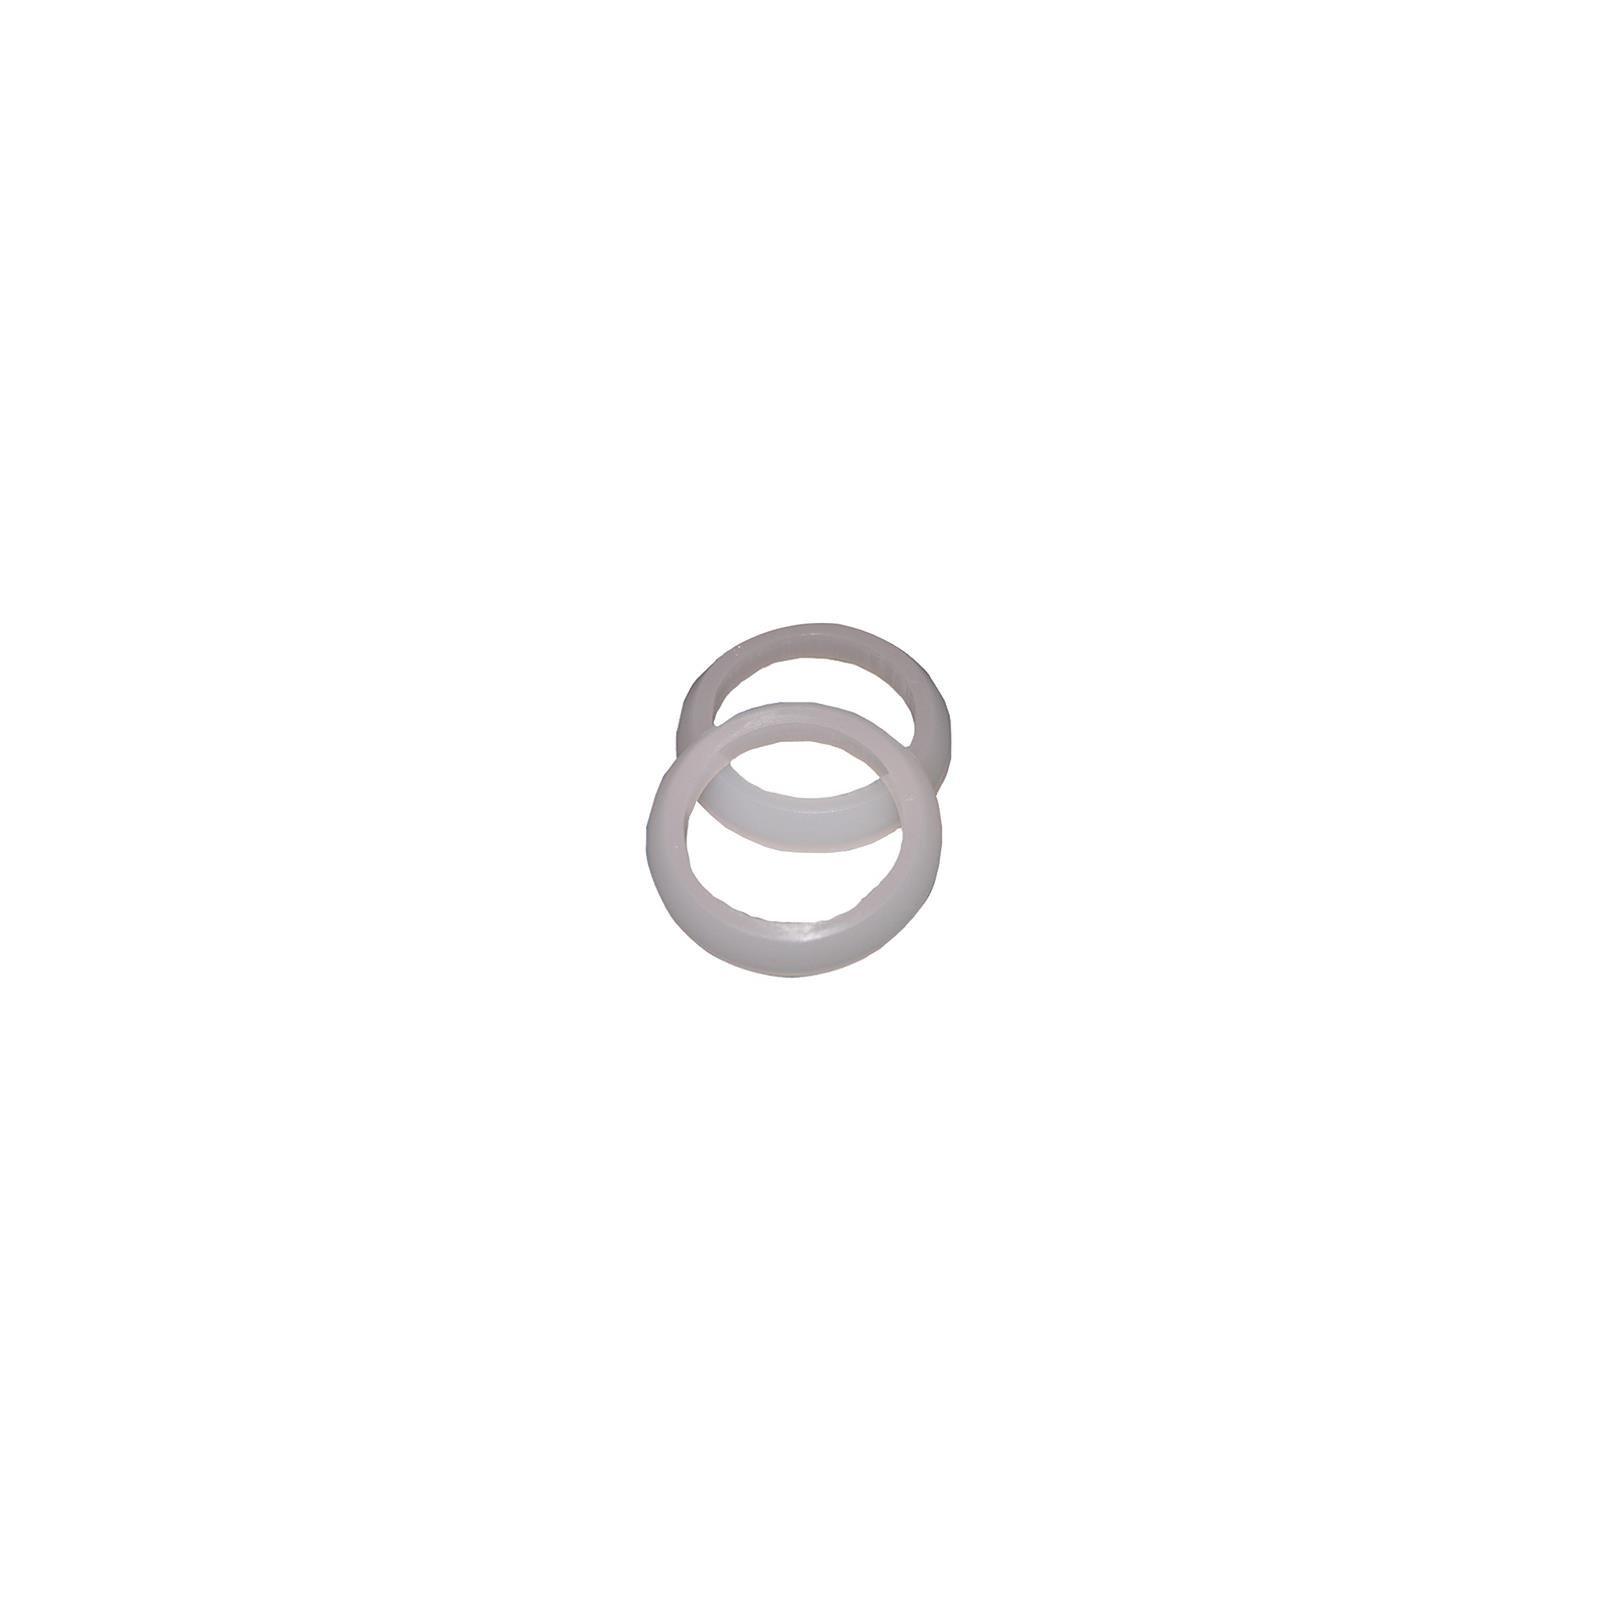 Larsen Supply 02-2287 Beveled Slip Joint Reducing Washer, Polyethylene, 2-Pk. - Quantity 6